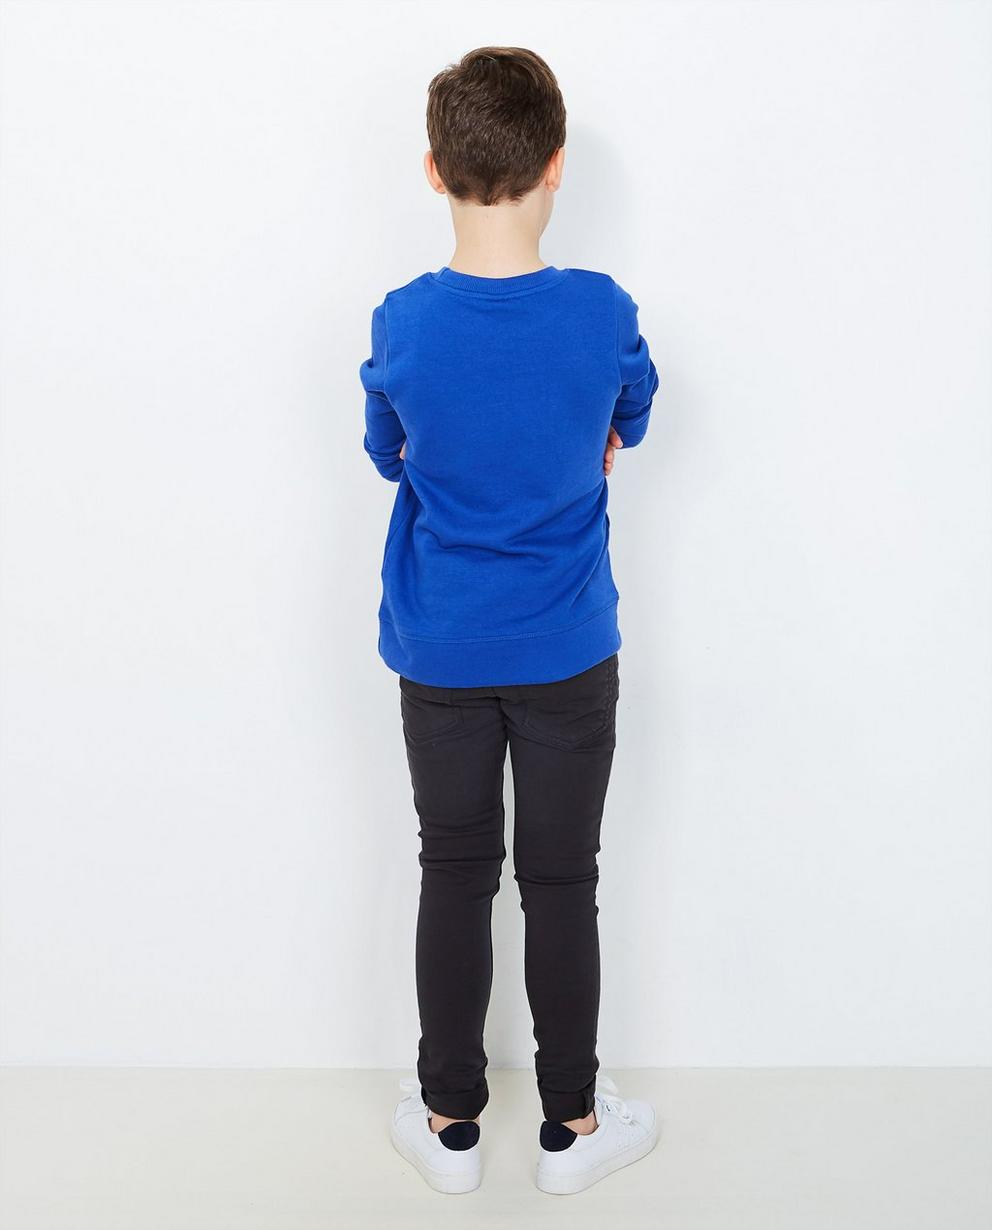 Sweater mit Sprechblase - in Knallblau - JBC